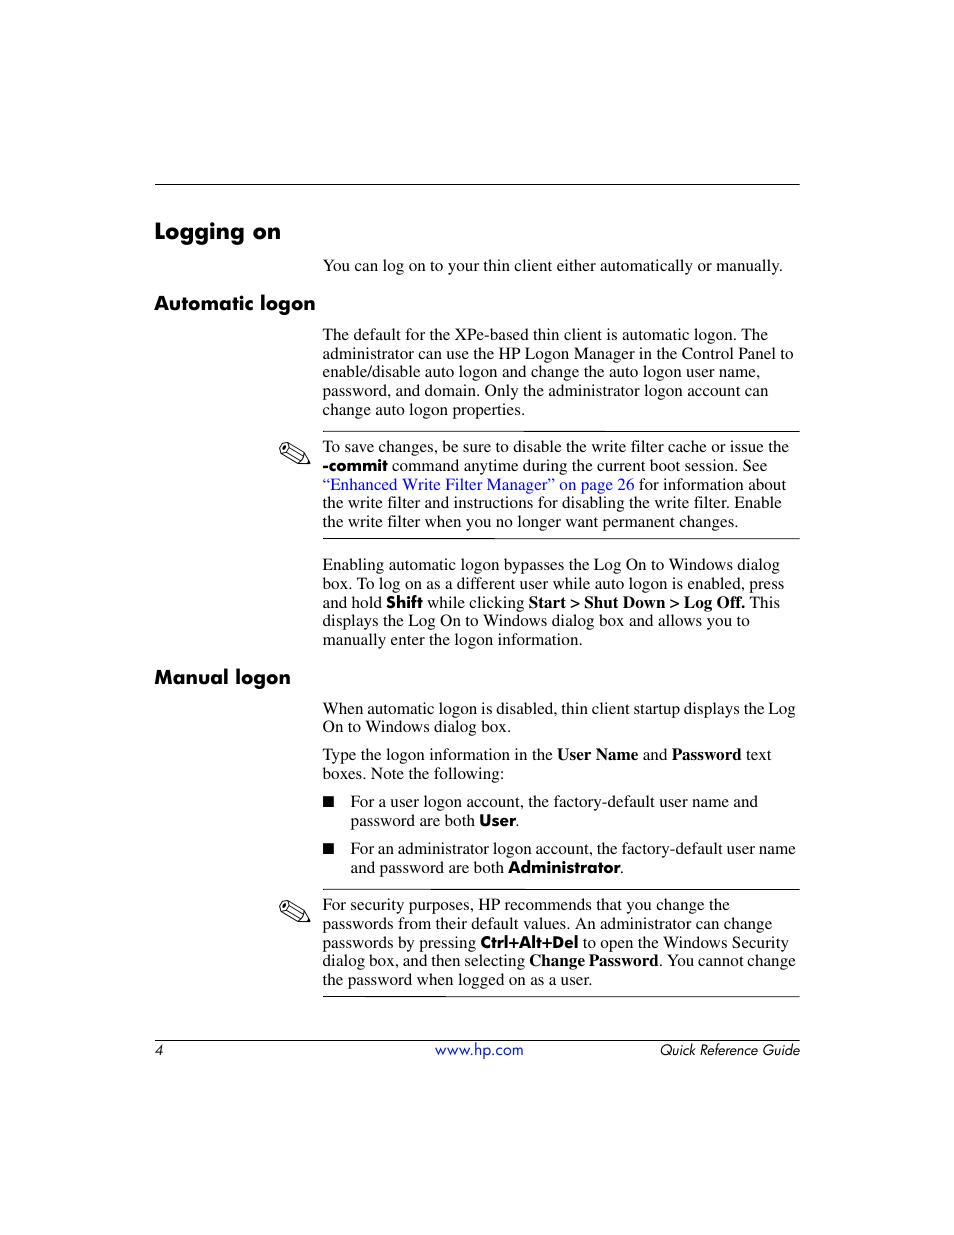 Logging on, Automatic logon, Manual logon | HP T5000 User